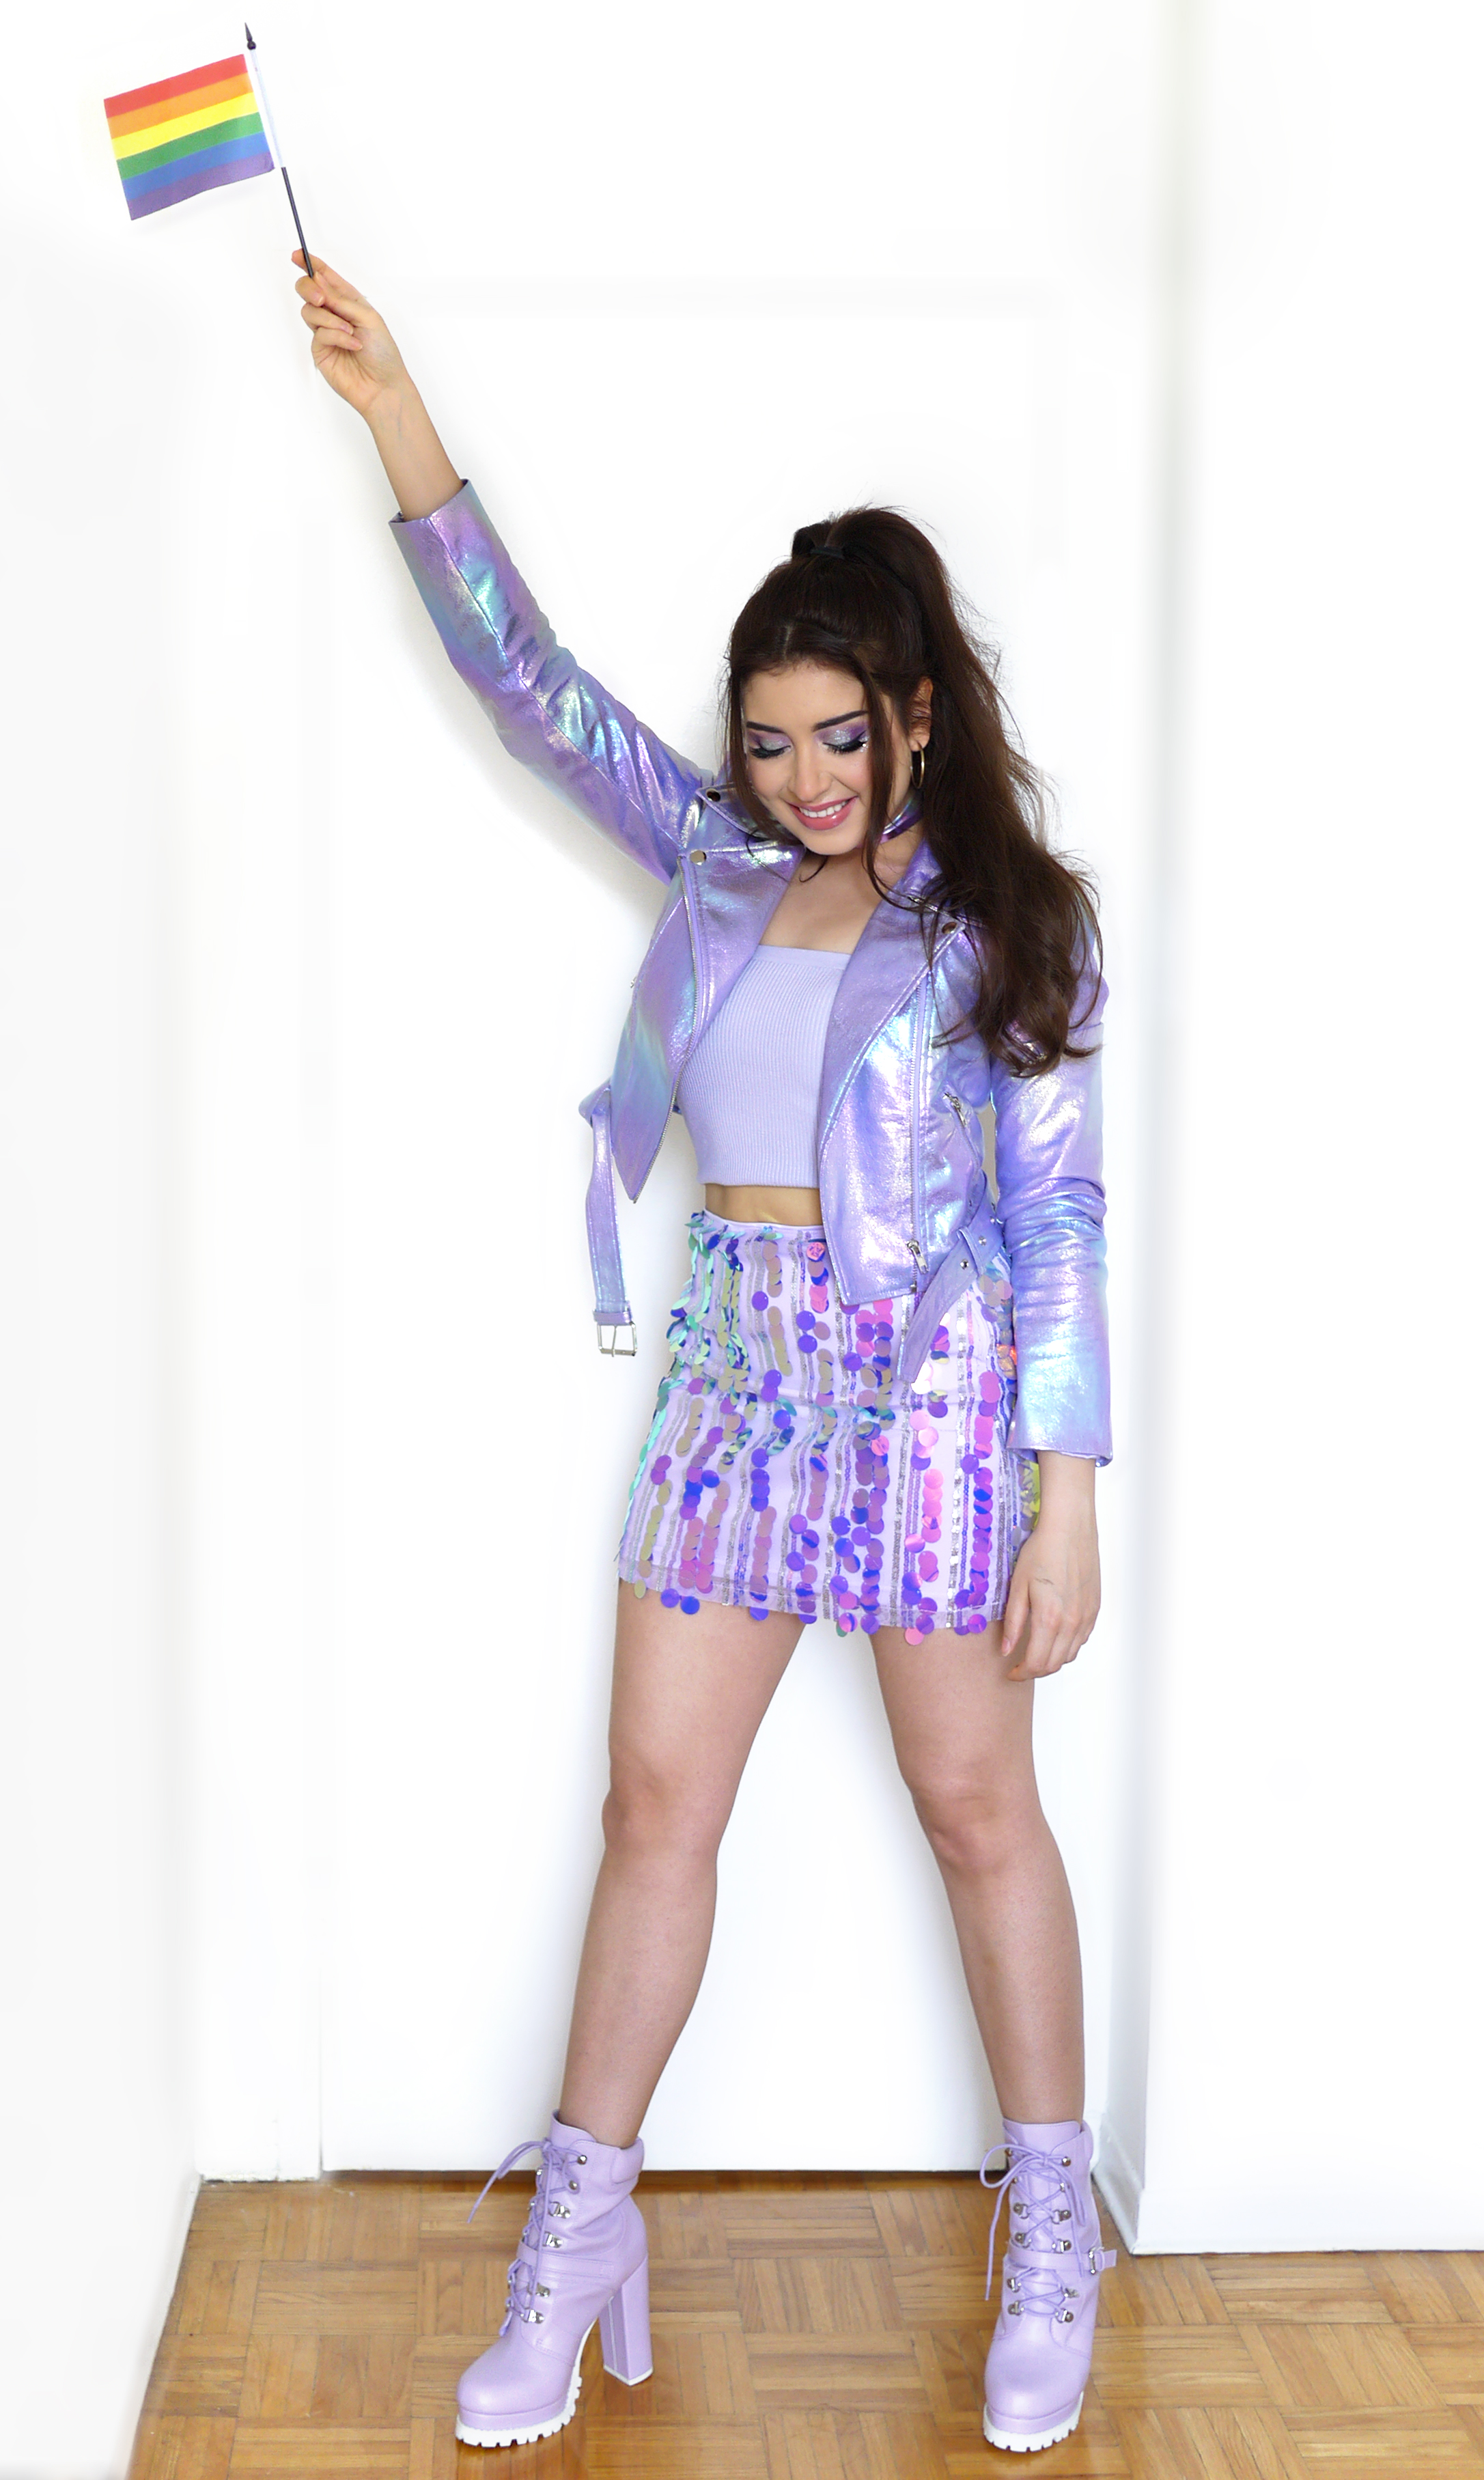 Iridescent Pride Outfit | Sara du Jour